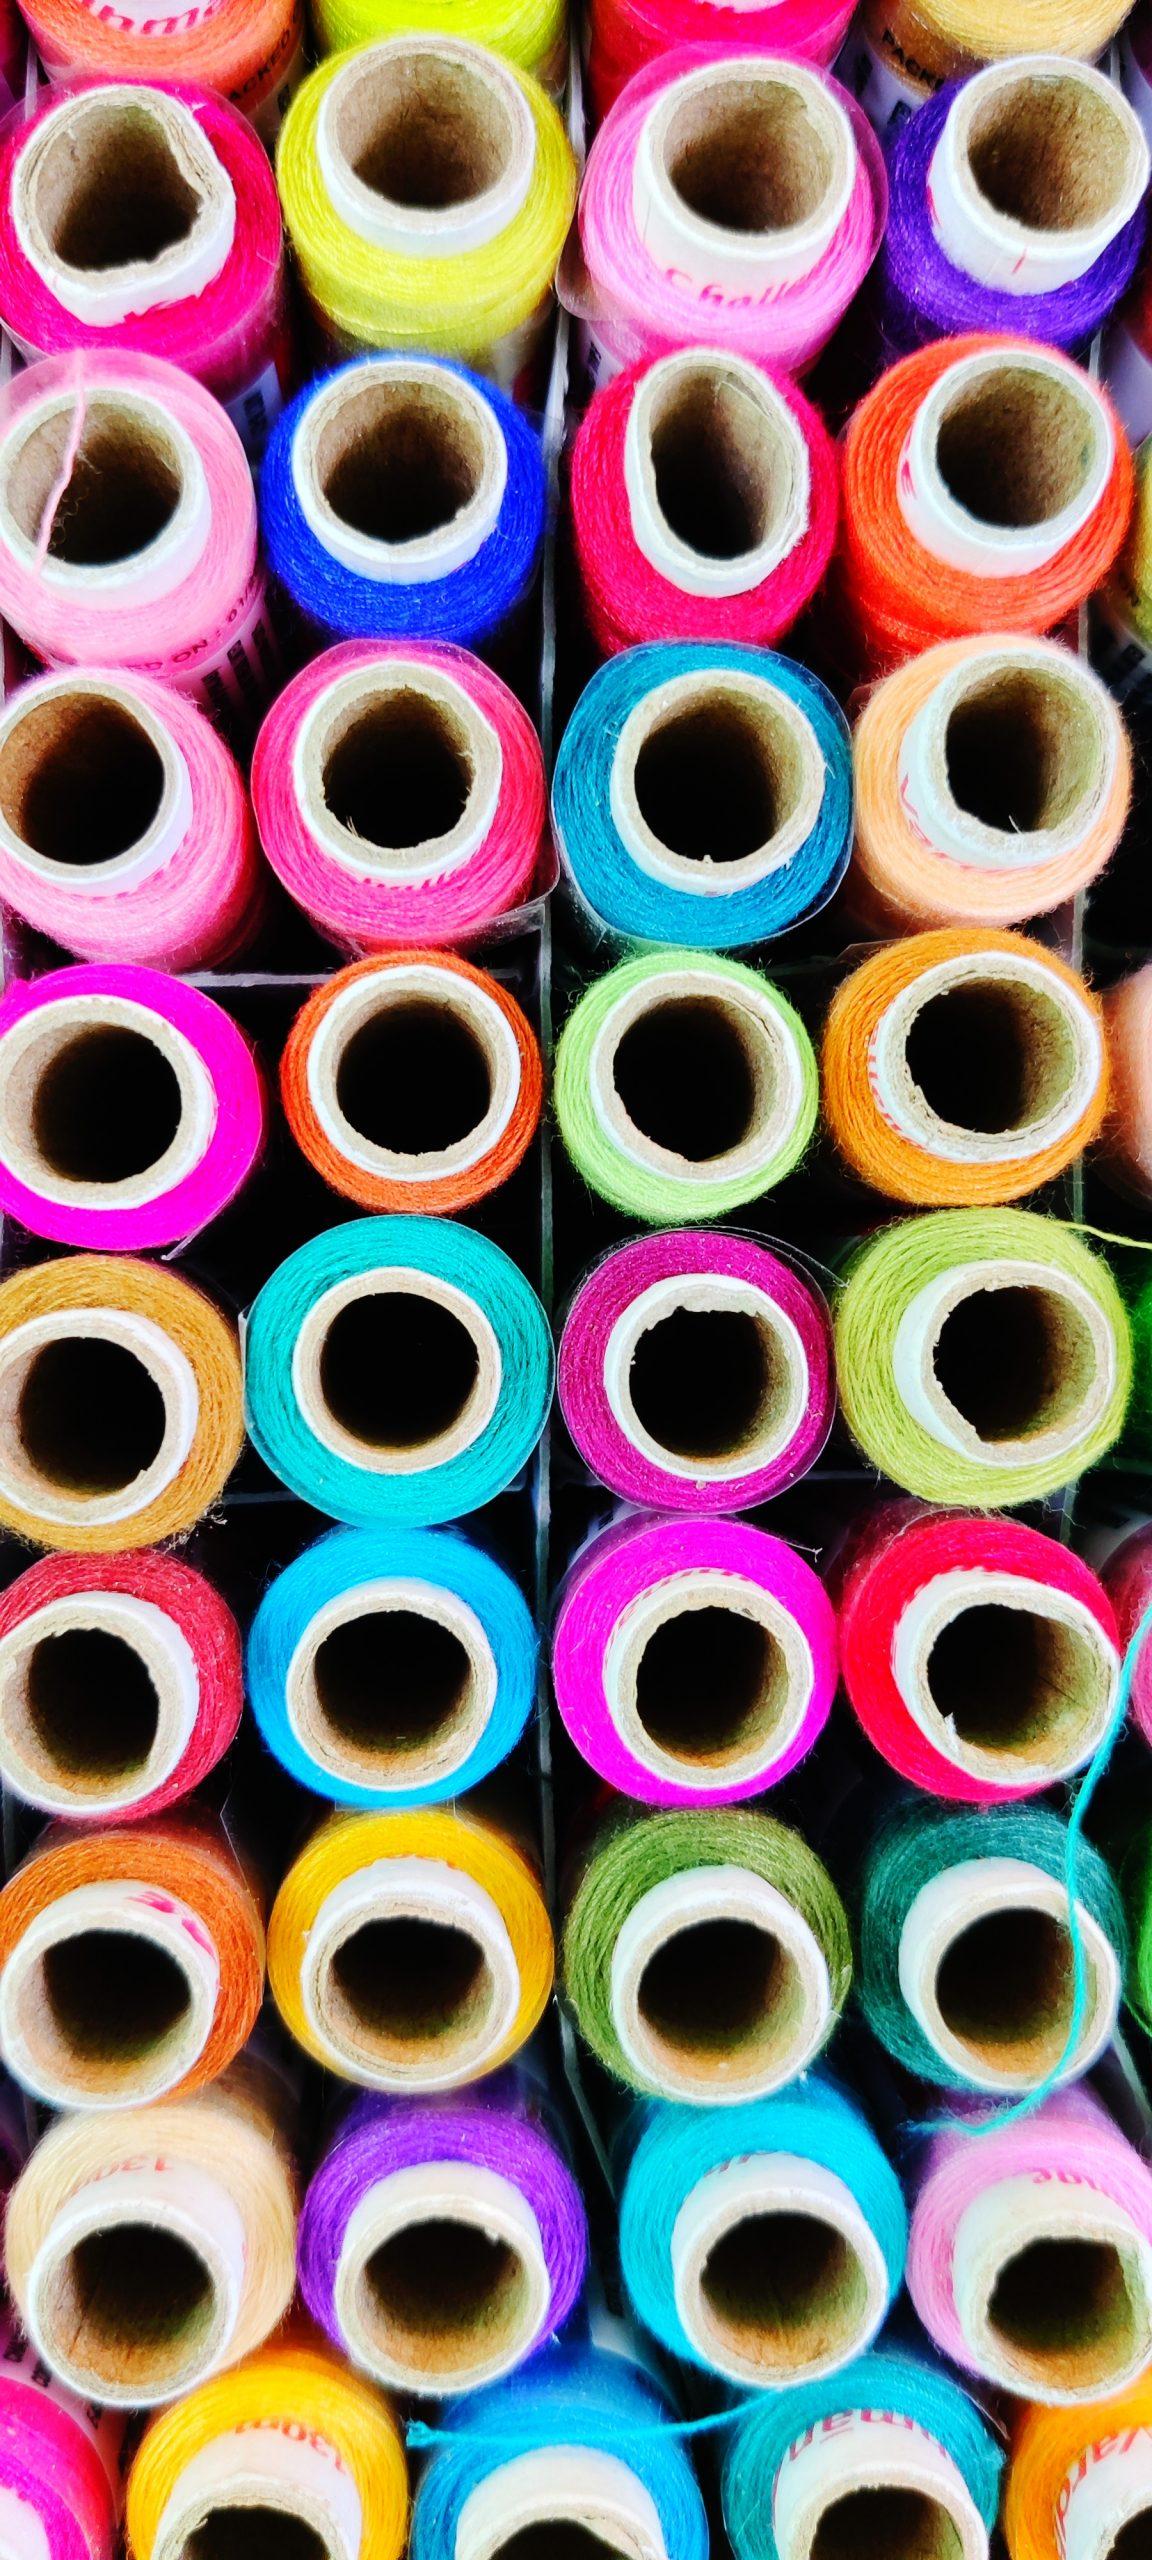 Stitching thread roll